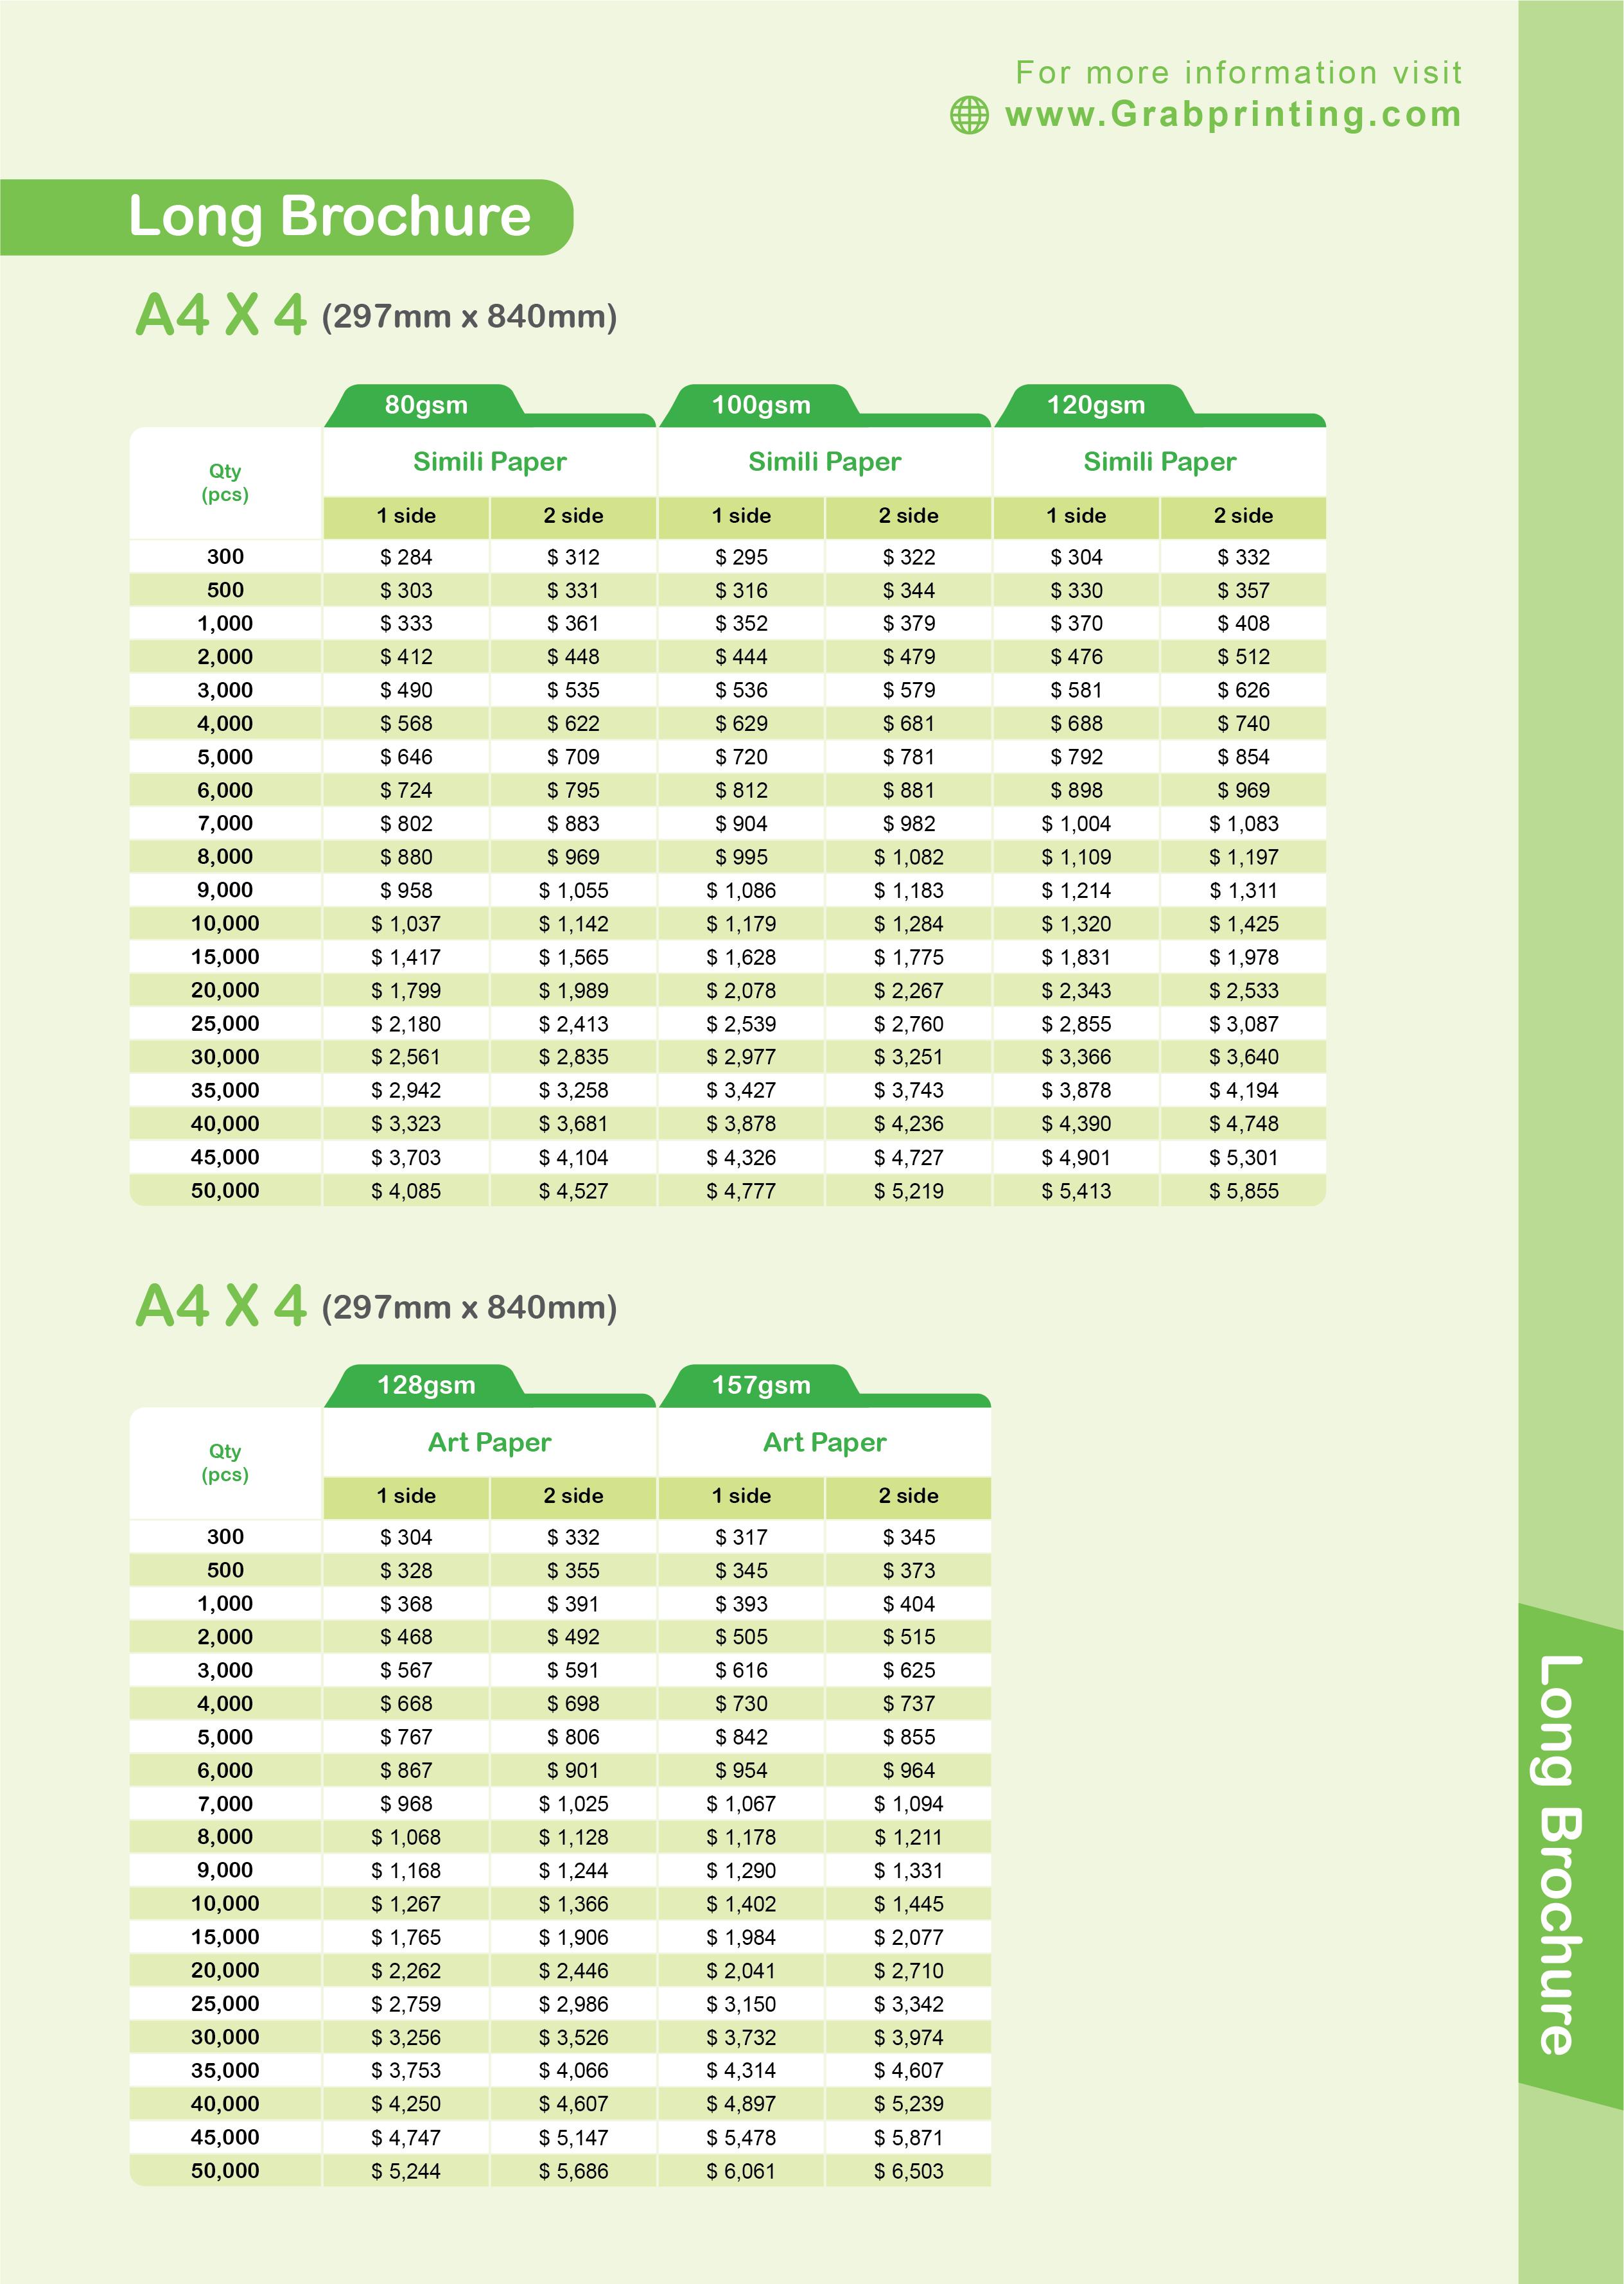 brochure printing Brochure Printing Long Brochure A4 x 4 Paper Price List